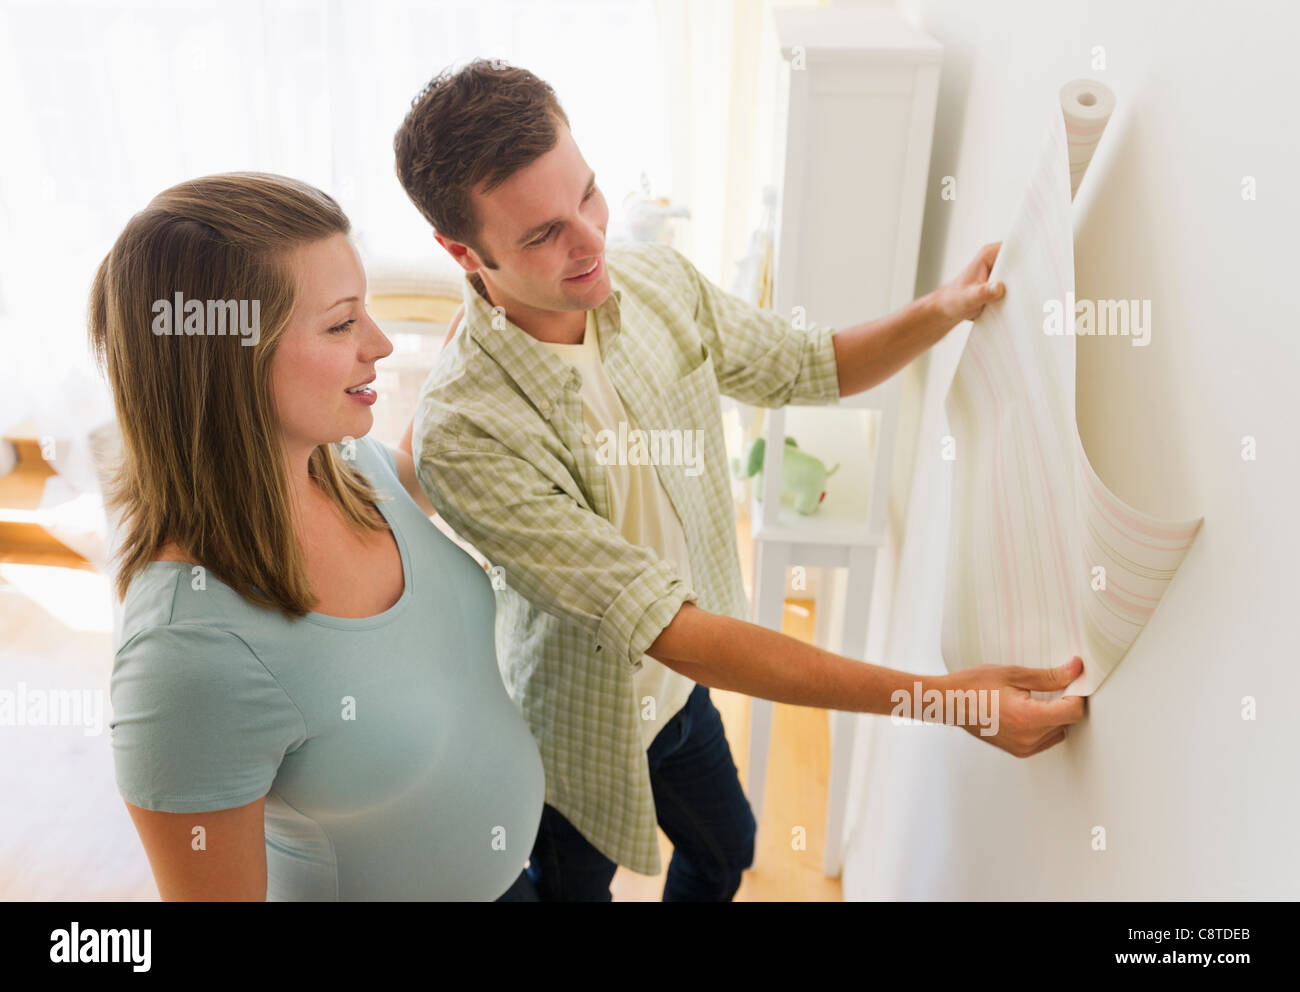 Junge schwangere paar Blick auf Tapete im Kinderzimmer Stockbild